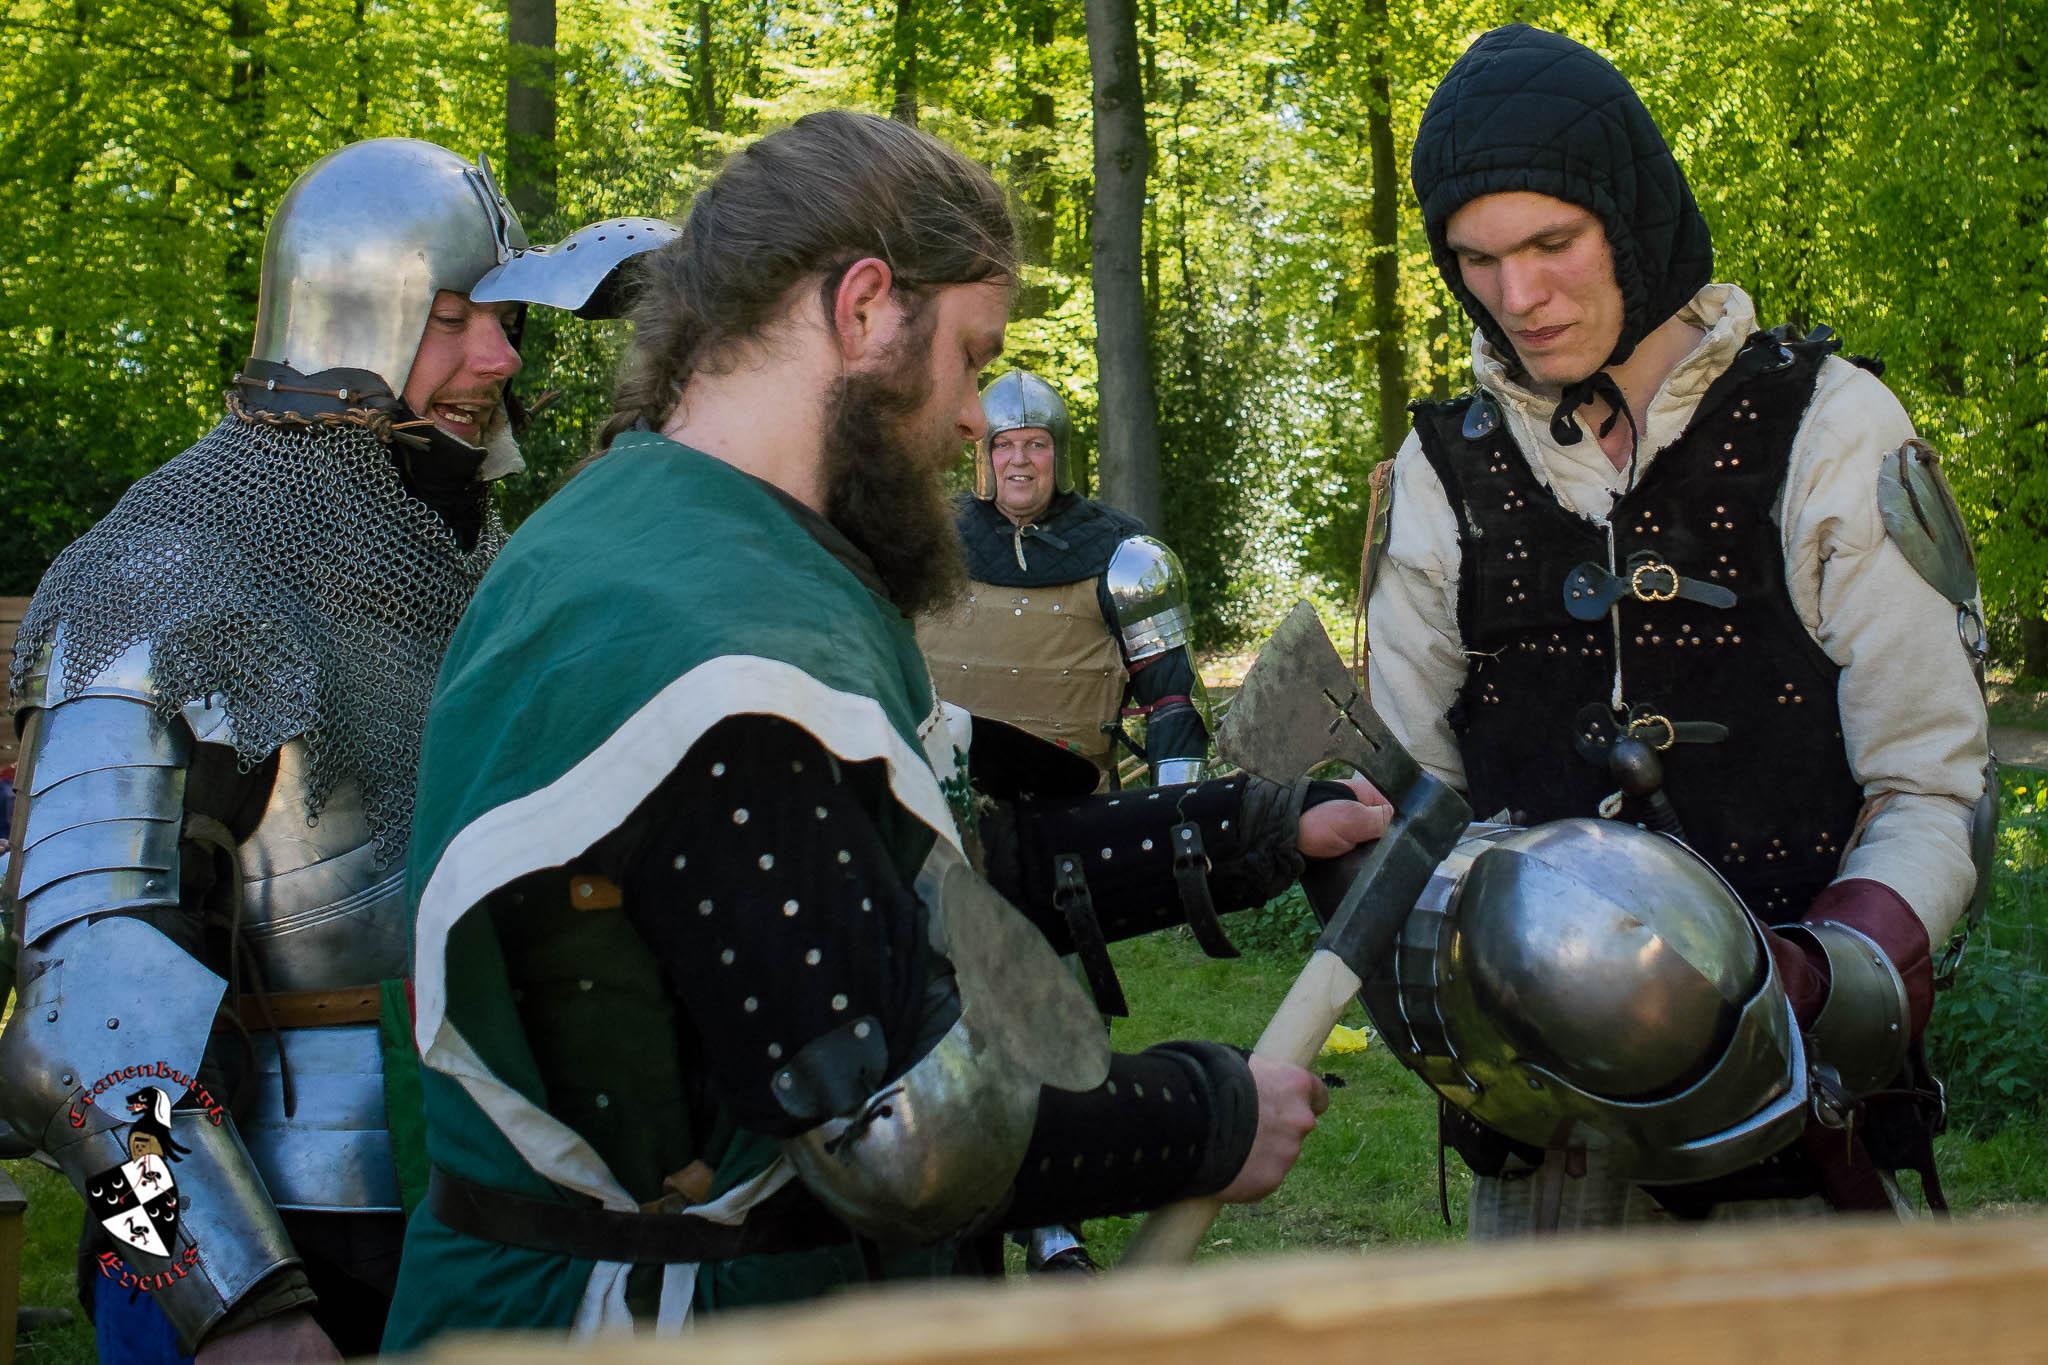 Middeleeuws-Festijn-Cannenburgh-2018-Algemeen-Ellen-la-Faille-38